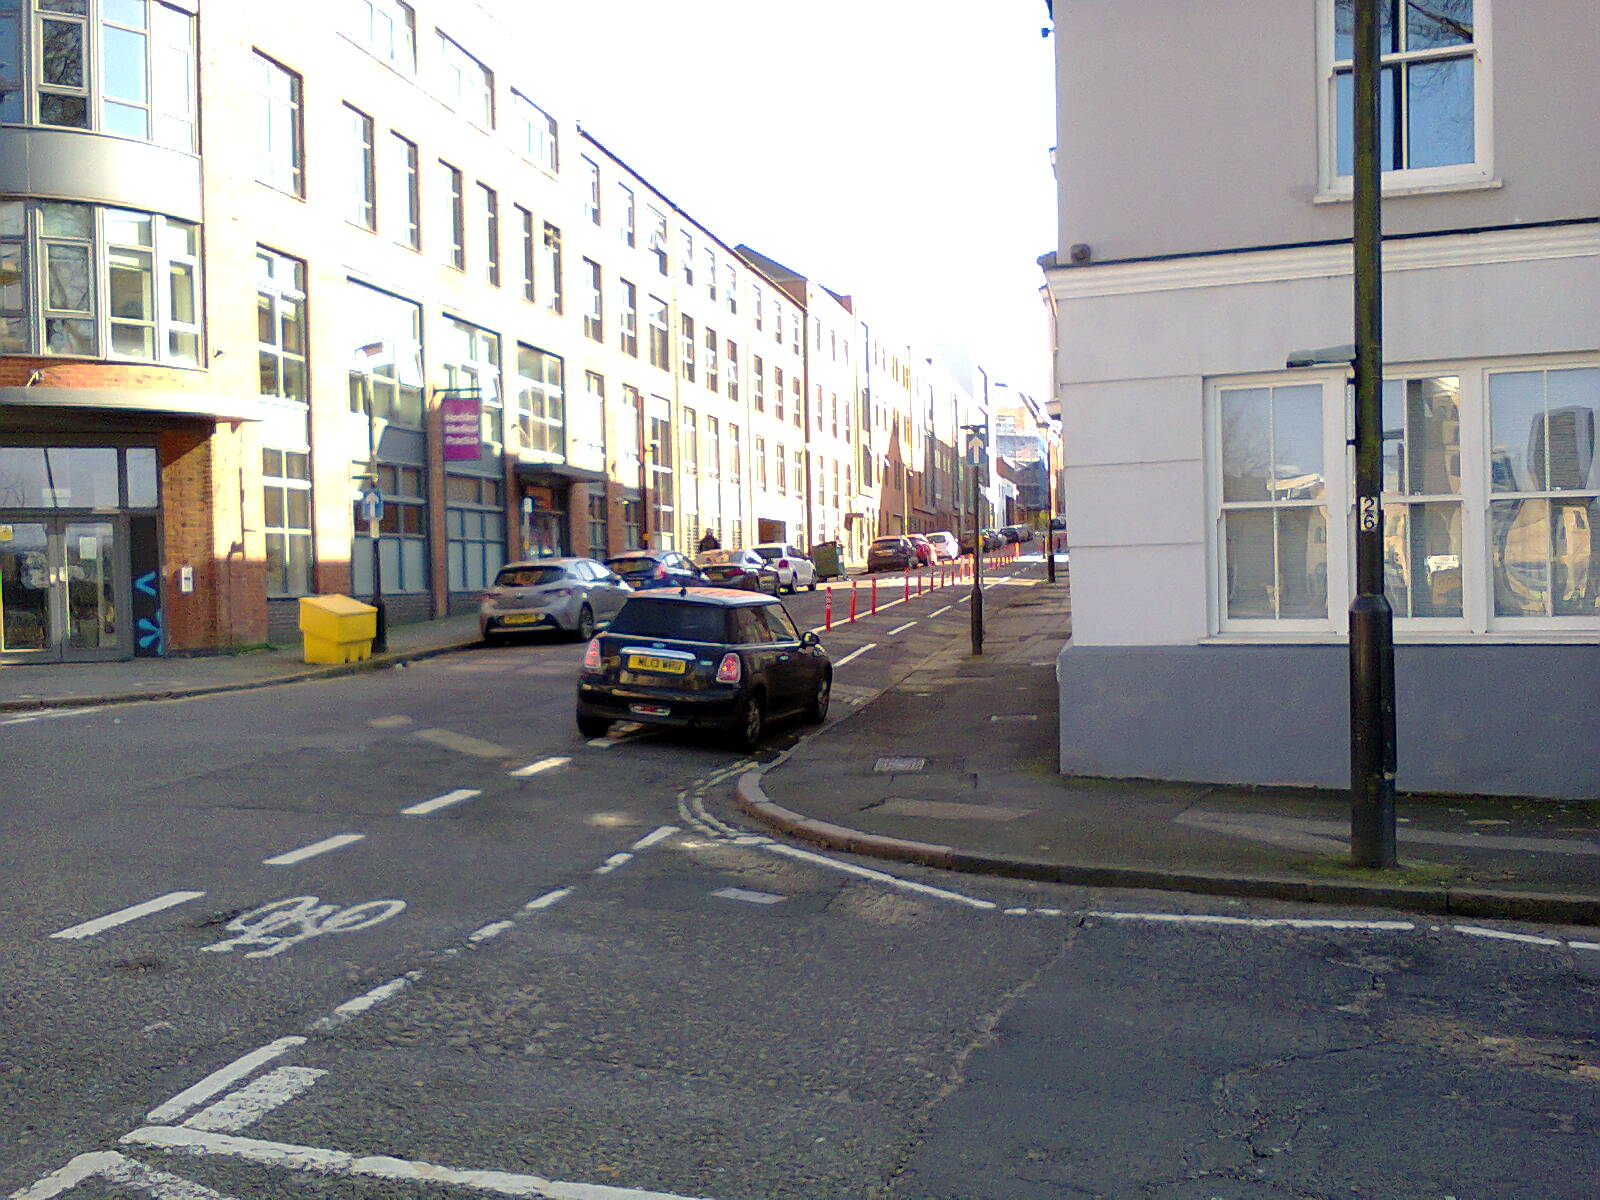 Carver Street - Warstone Lane Junction